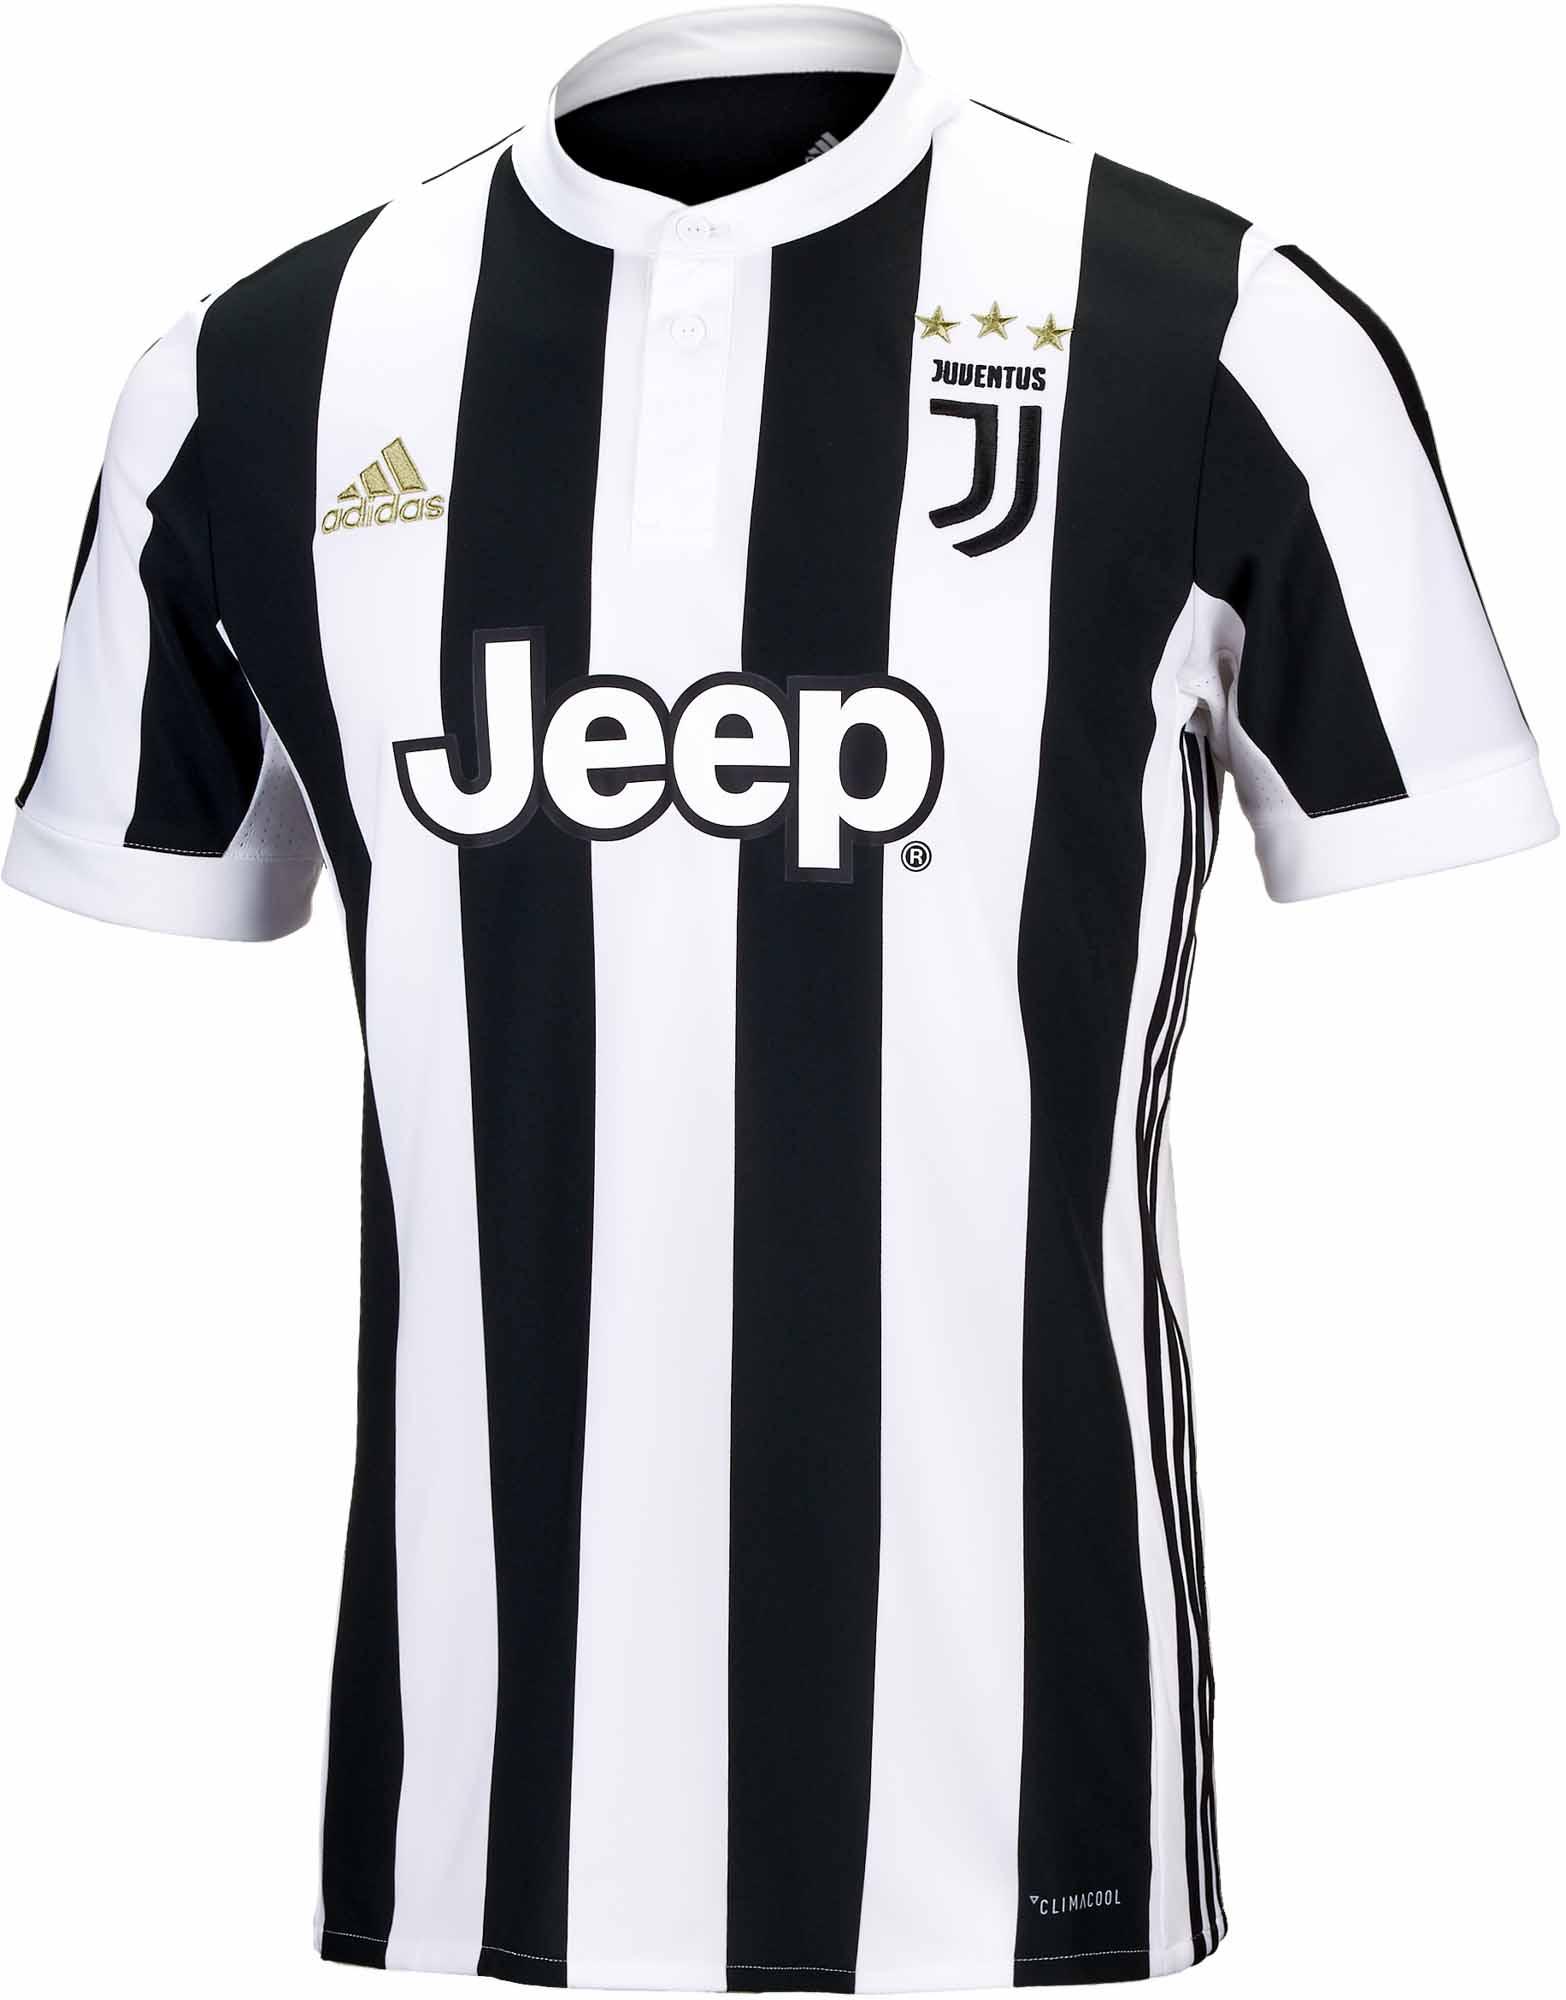 Juventus Home | Hot Trending Now